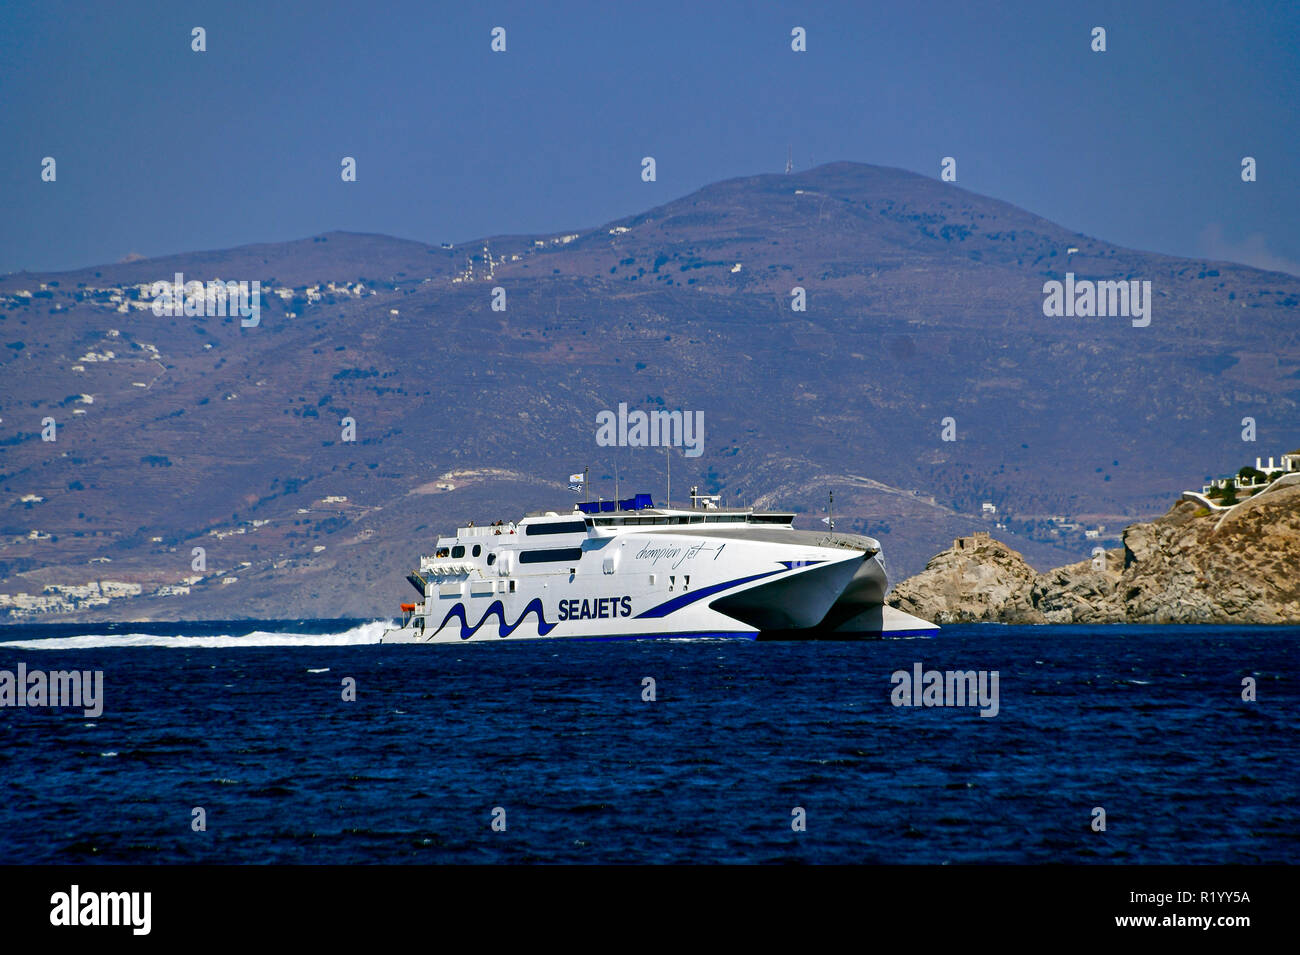 Seajets catemaran Champion Jet 1 near Mykonos town on island Mykonos in the Cyclades group in the Aegean Sea Greece - Stock Image